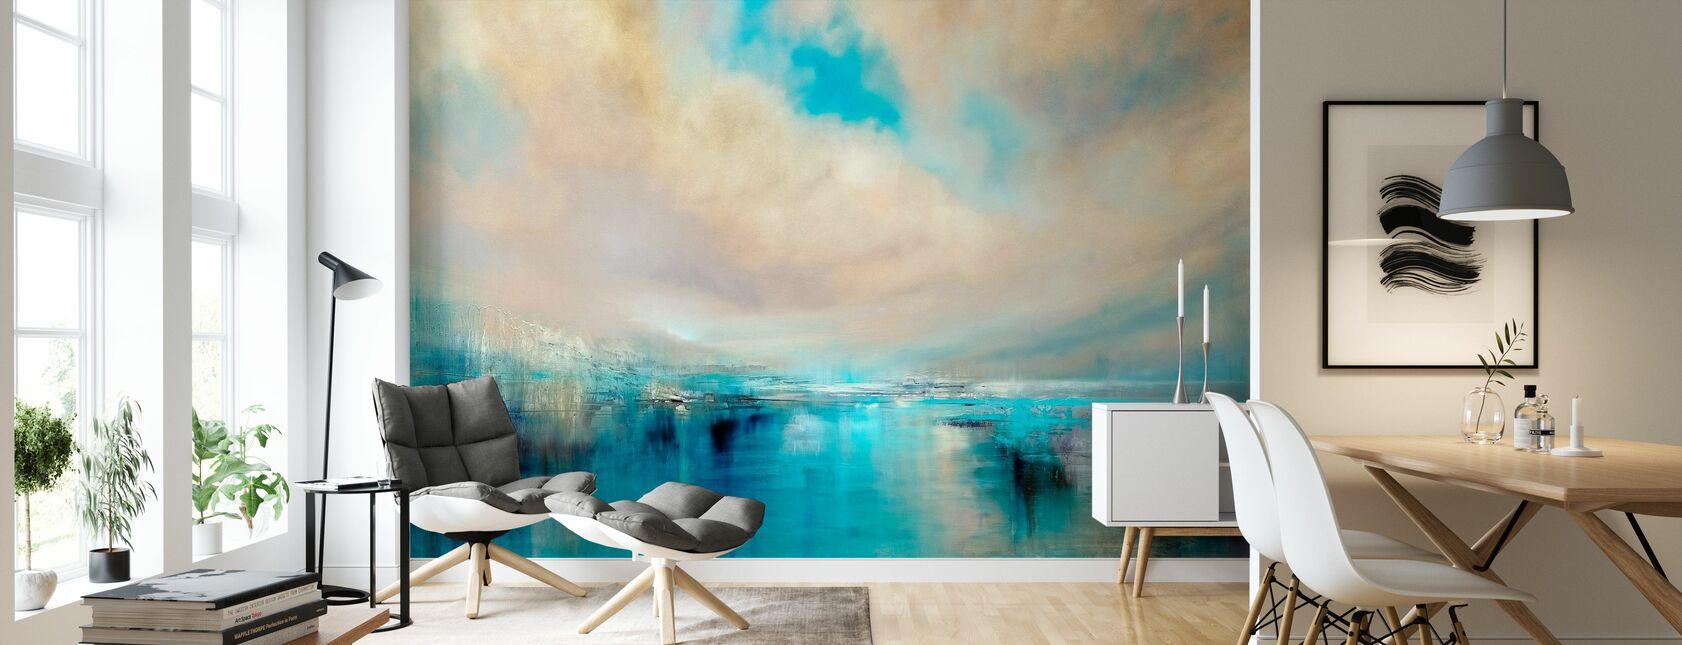 Arrived - Wallpaper - Living Room